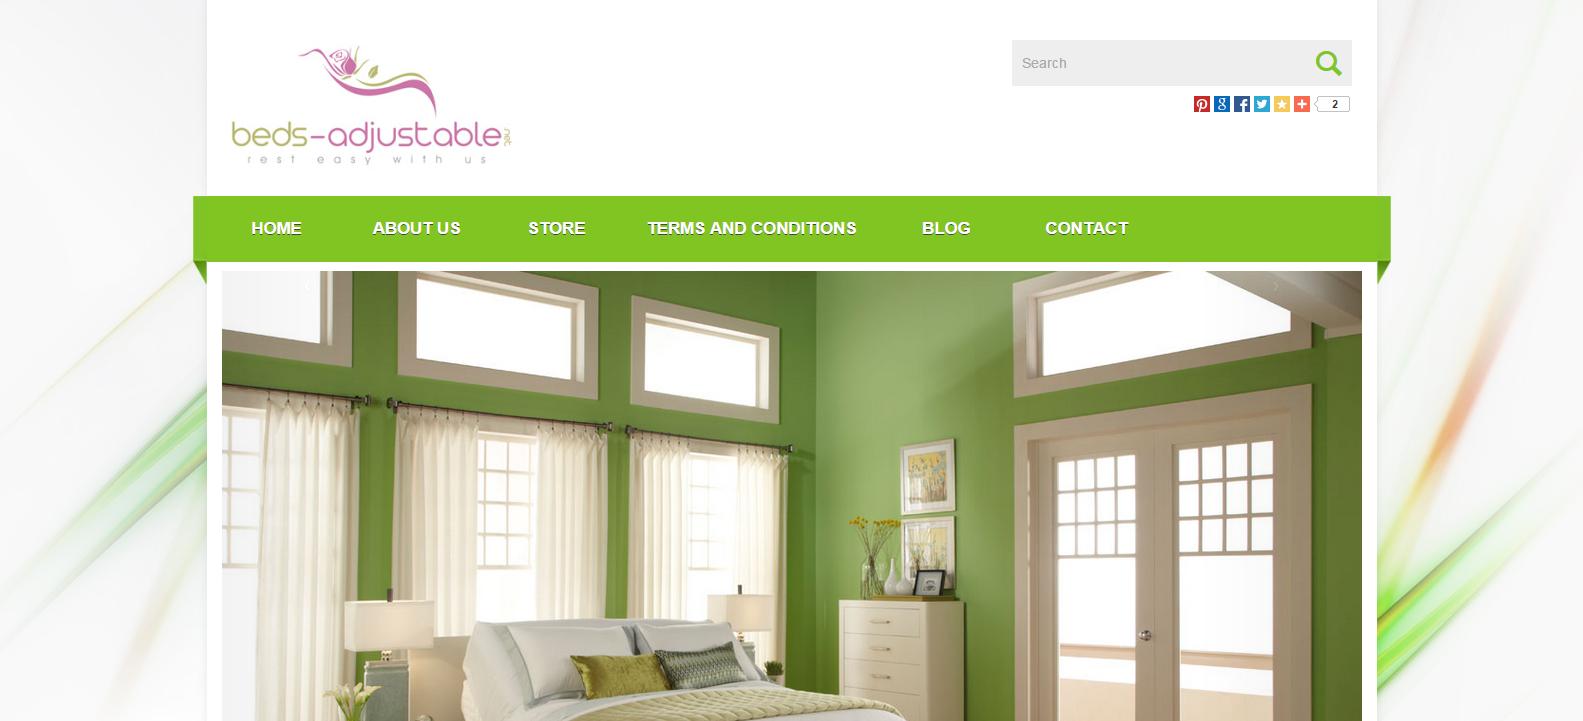 Beds-Adjustable.net (eCommerce)